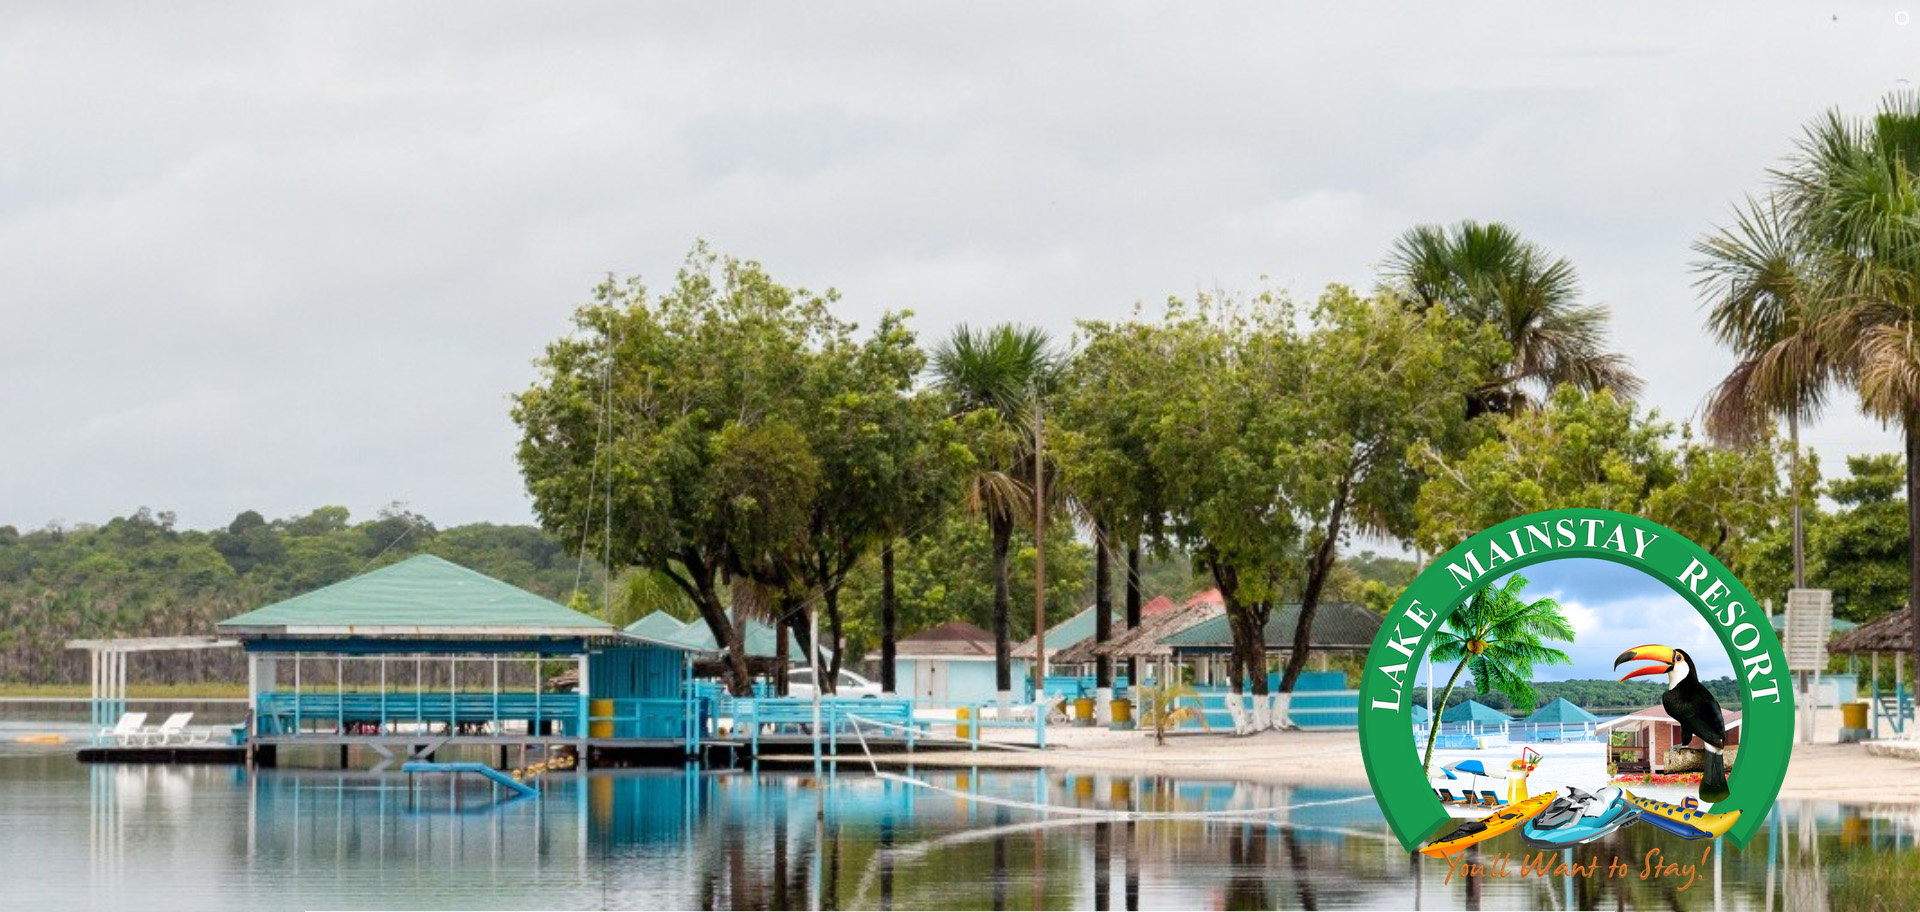 Lake Main Stay & Charity Tour